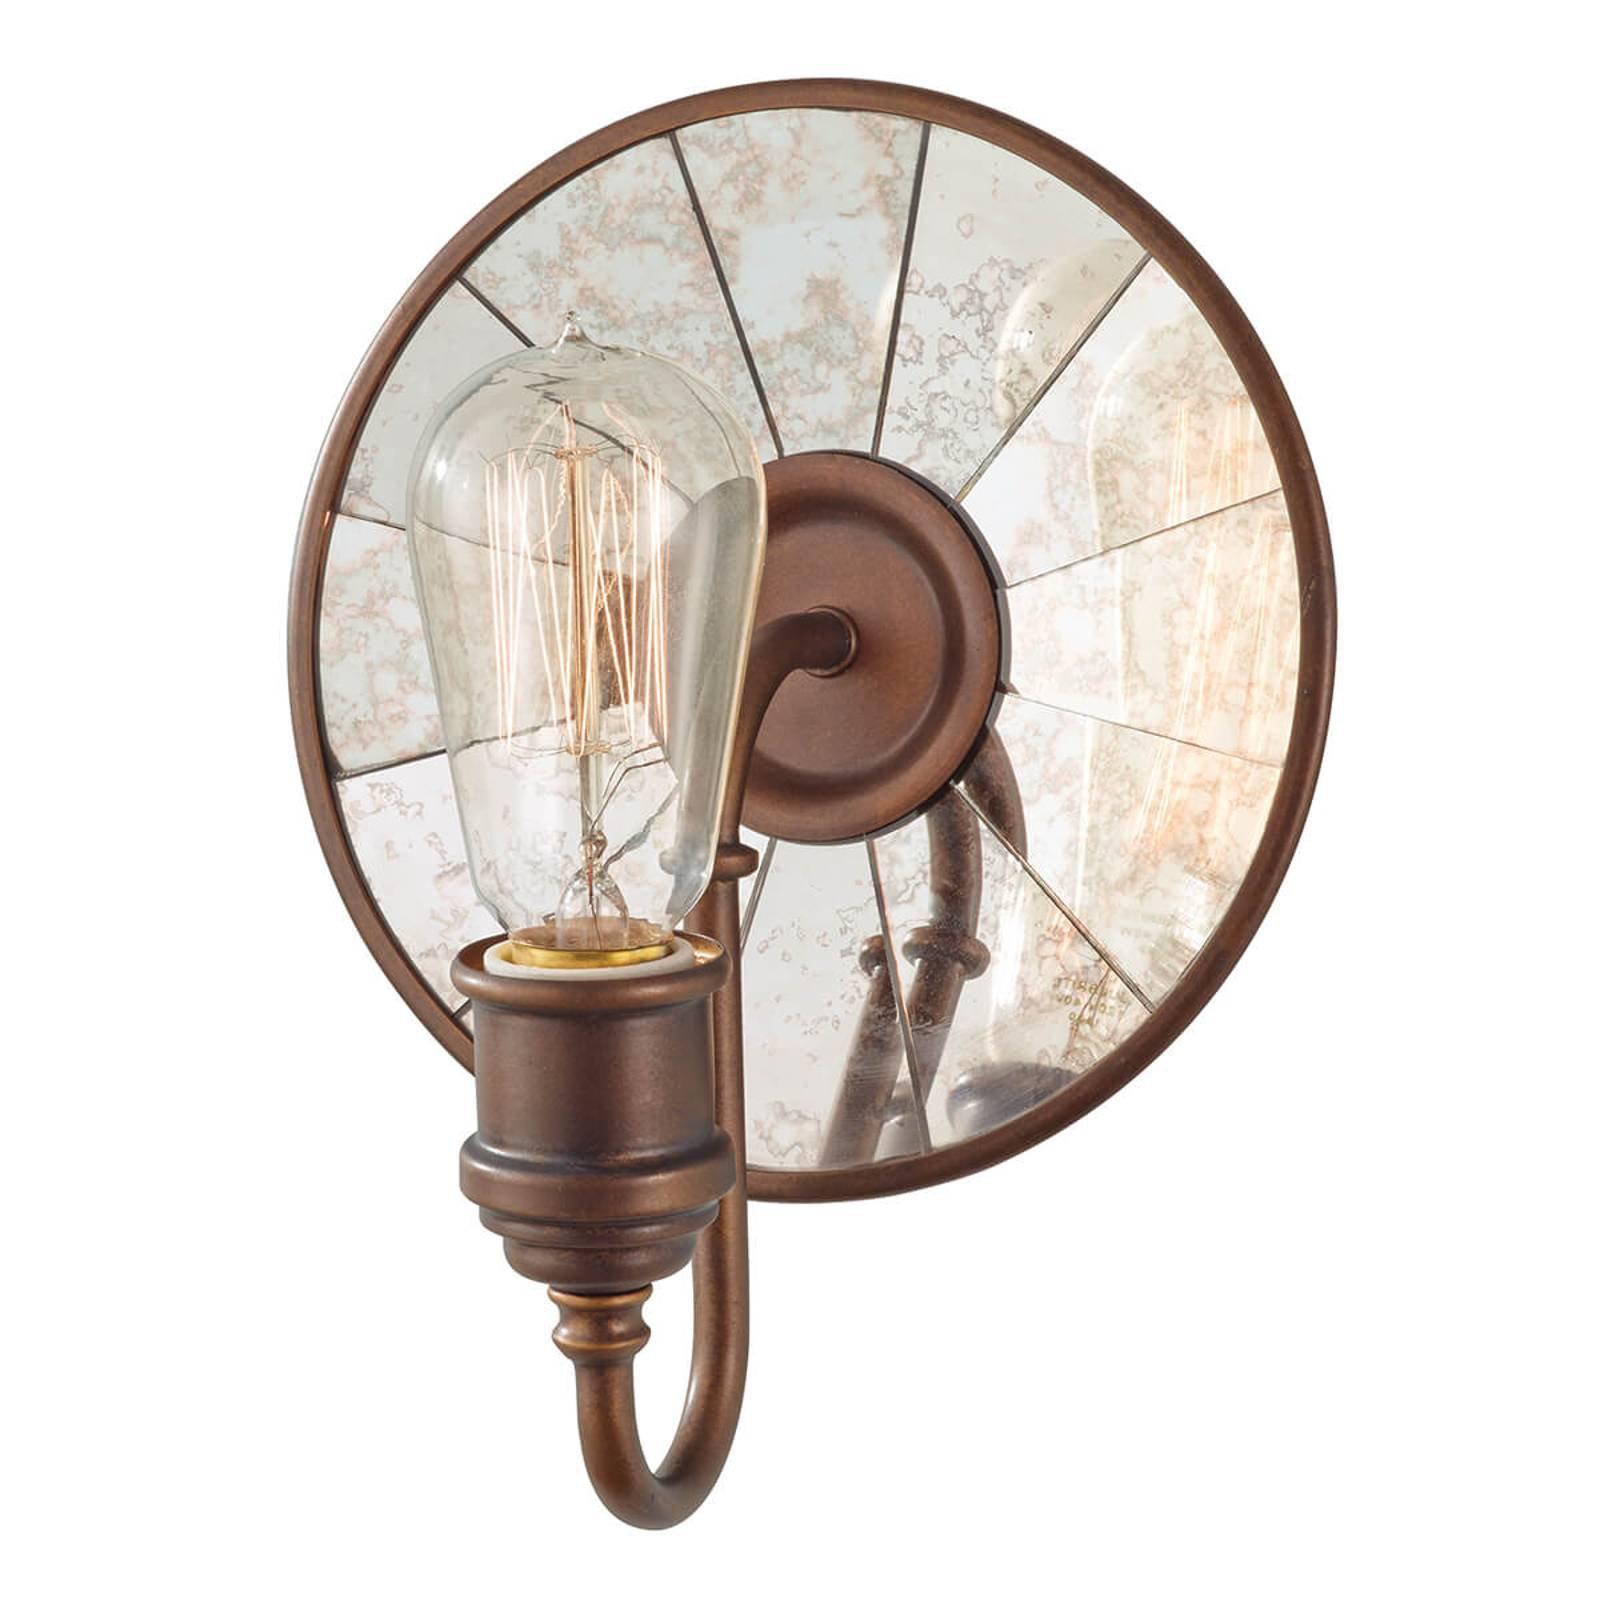 Vegglampe Urban Renewal med speilglass i bronse